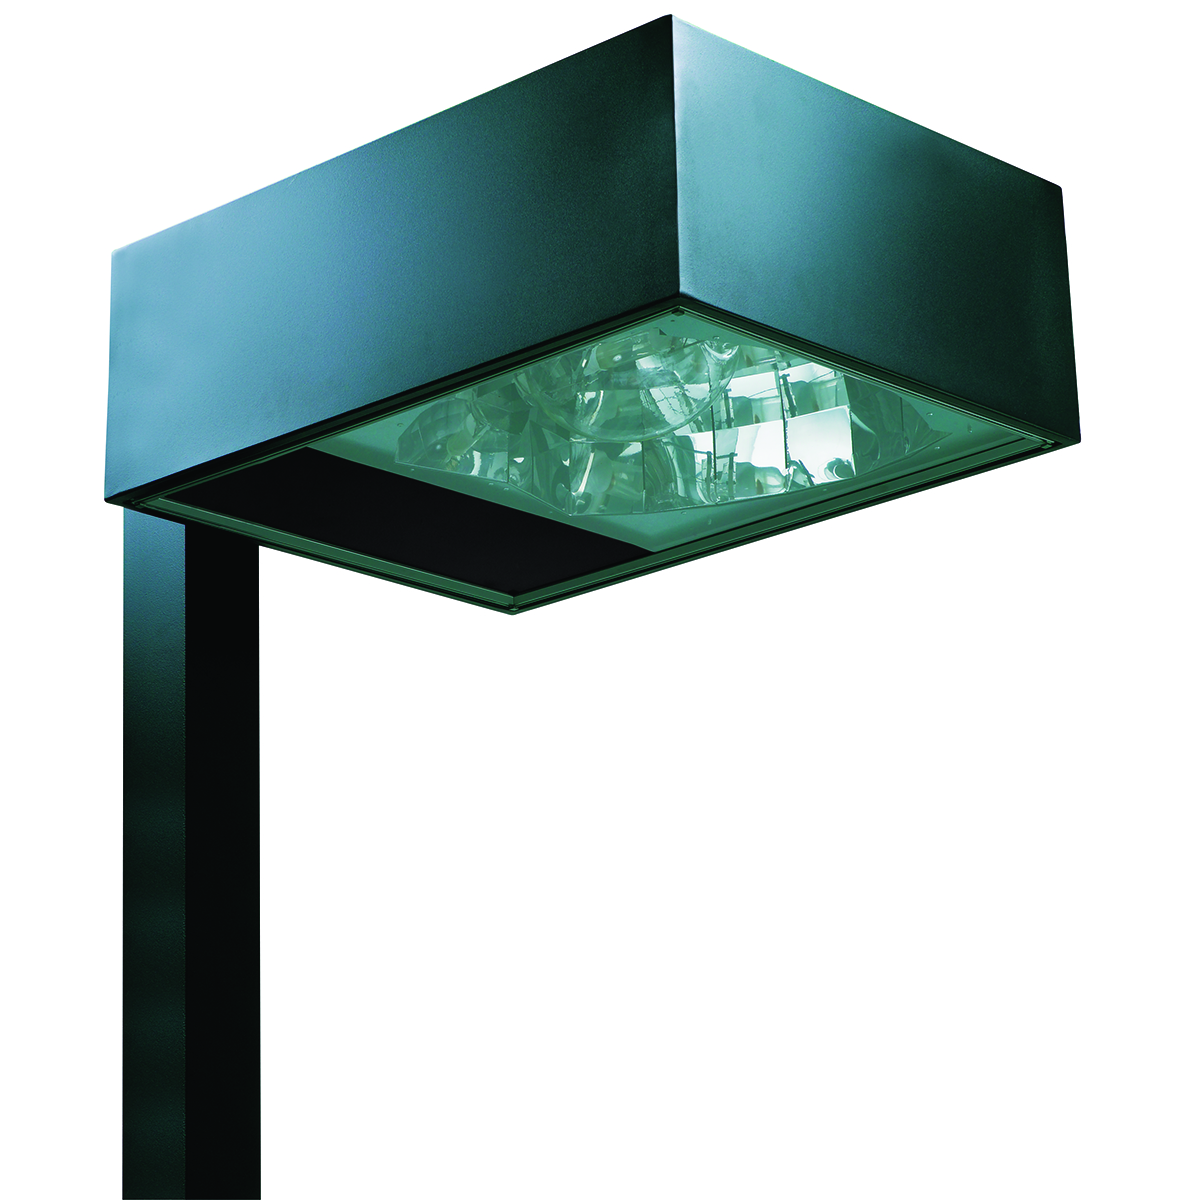 Hubbell Spaulding Lighting,RCS-A4-P40-H4-F-Q-DB-L,FRMD AL 400W PMH QTAP TYPE 4 BRZ LP